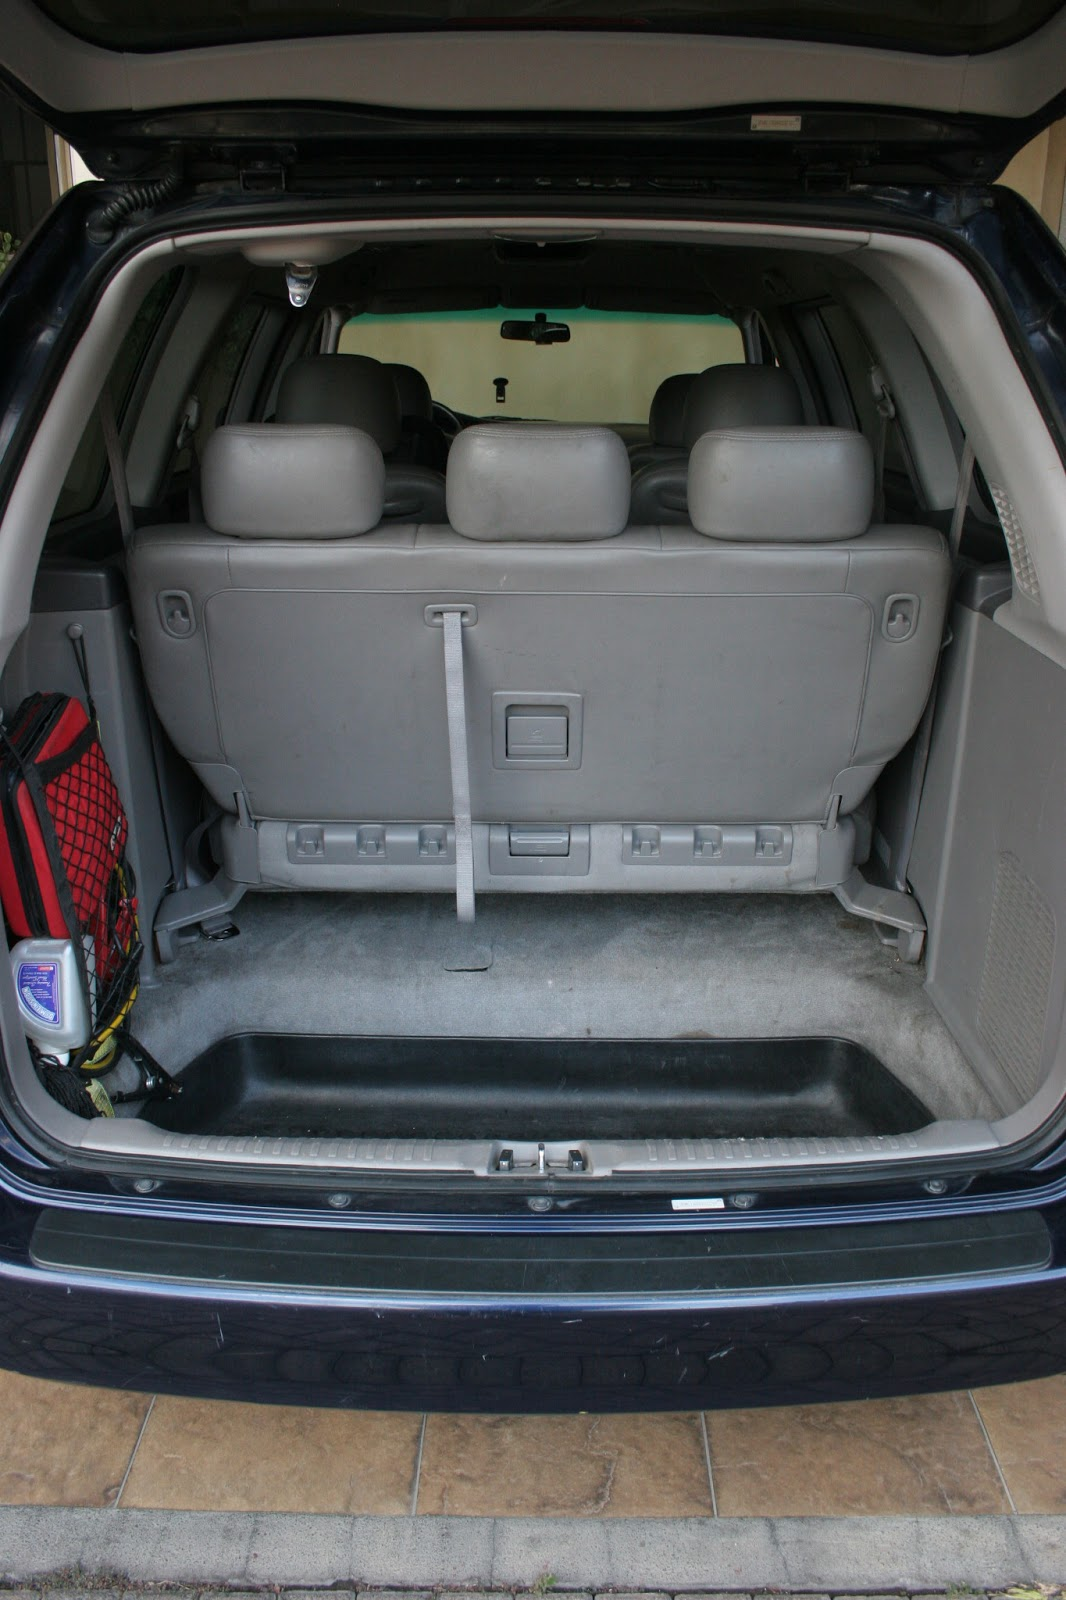 2004 honda odyssey ex l minivan 100 000 miles rubesh san jose for sale list. Black Bedroom Furniture Sets. Home Design Ideas